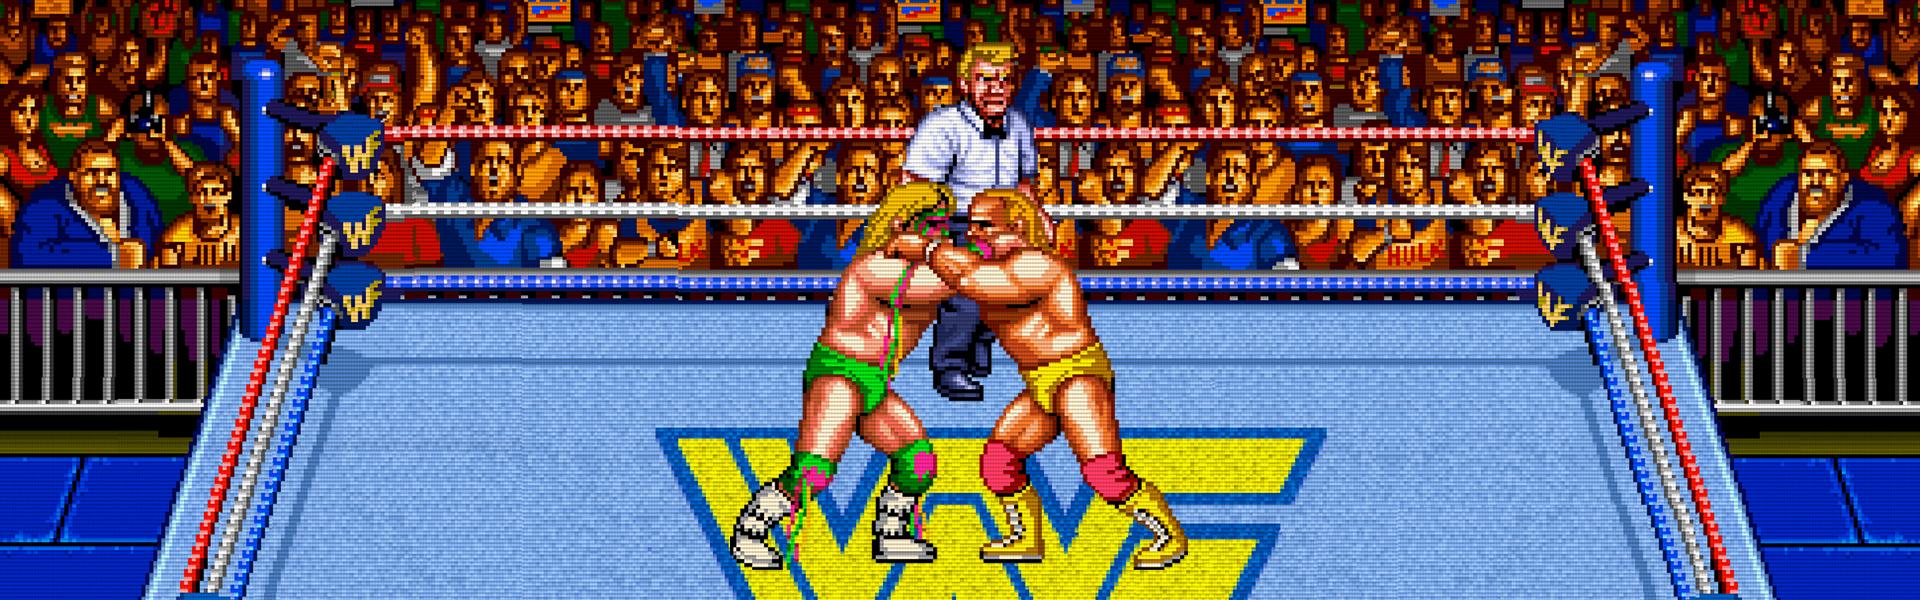 MPU_Ep20_Wrestling_Games_1920x600